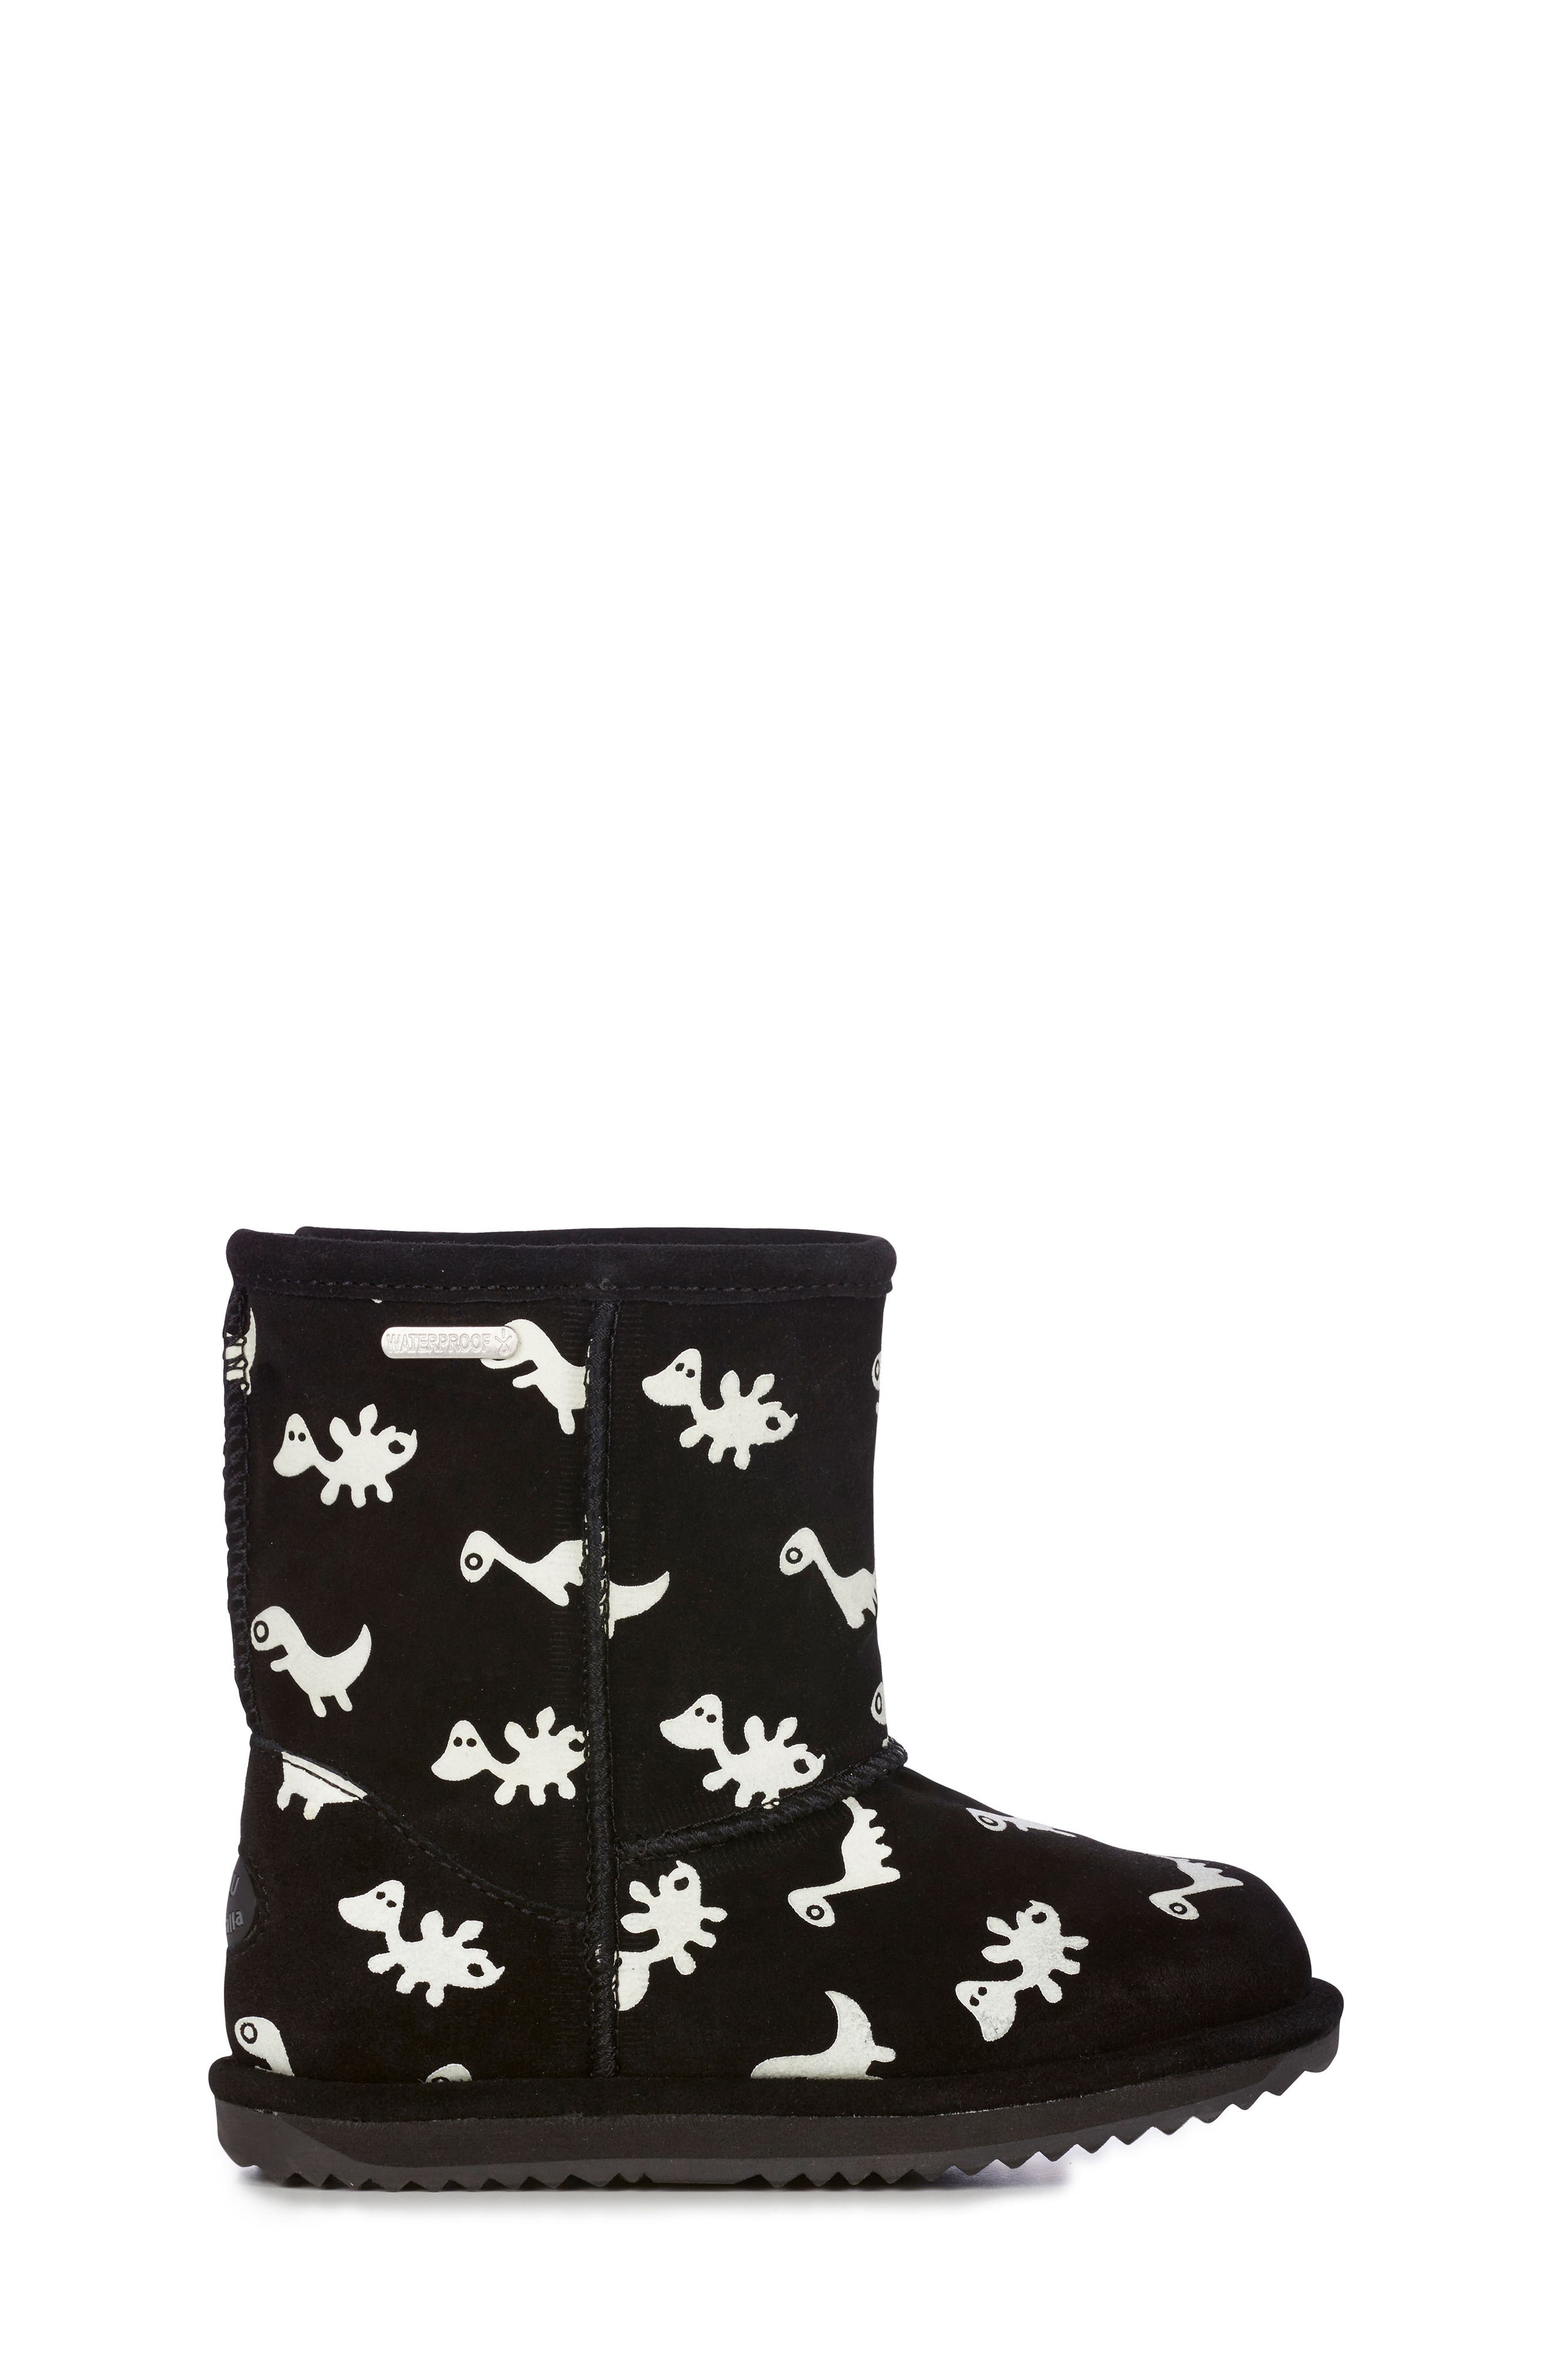 Animal Print Boots,                             Alternate thumbnail 3, color,                             BLACK